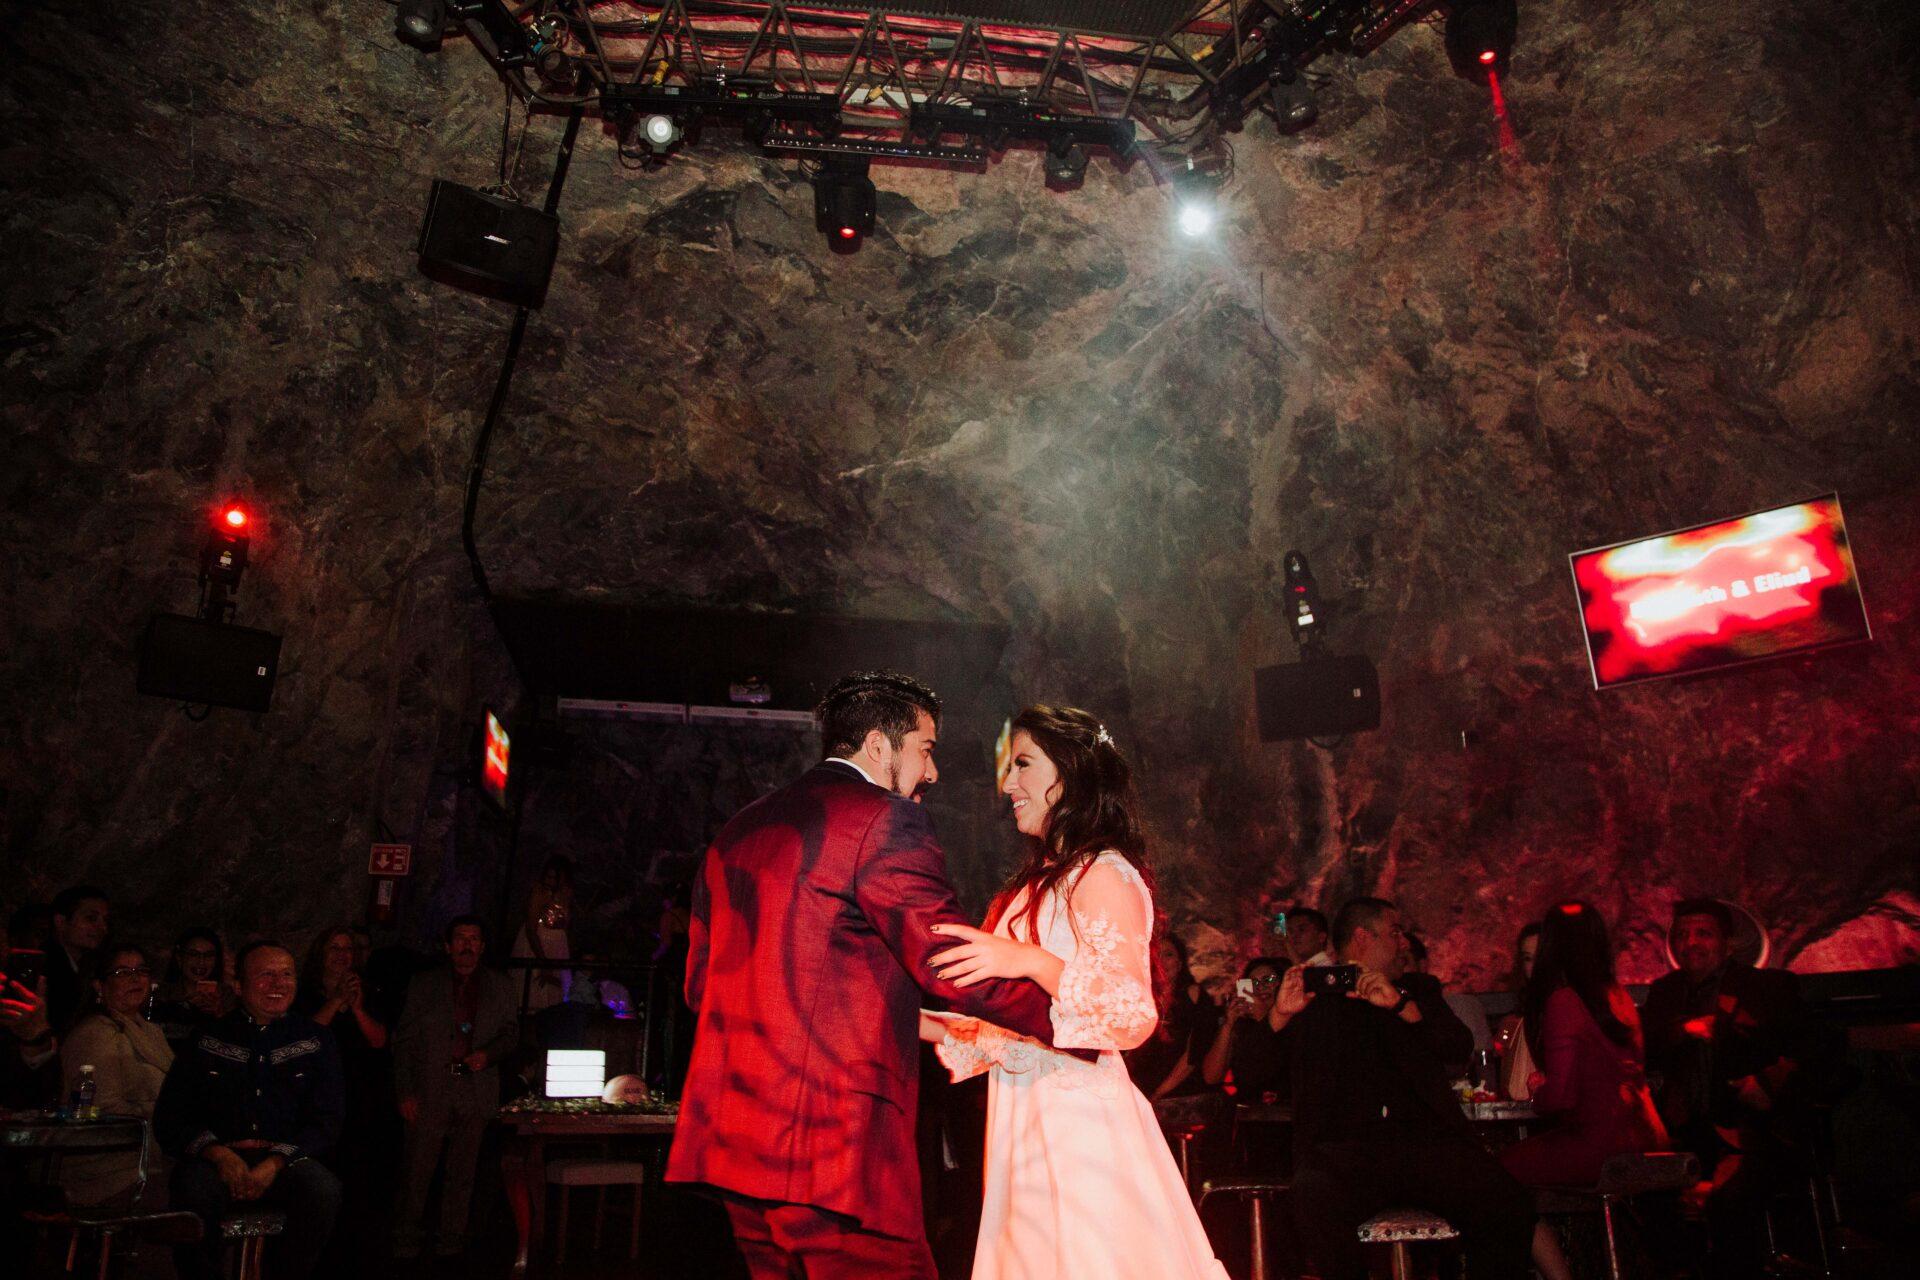 javier_noriega_fotografo_bodas_la_mina_club_zacatecas_wedding_photographer16